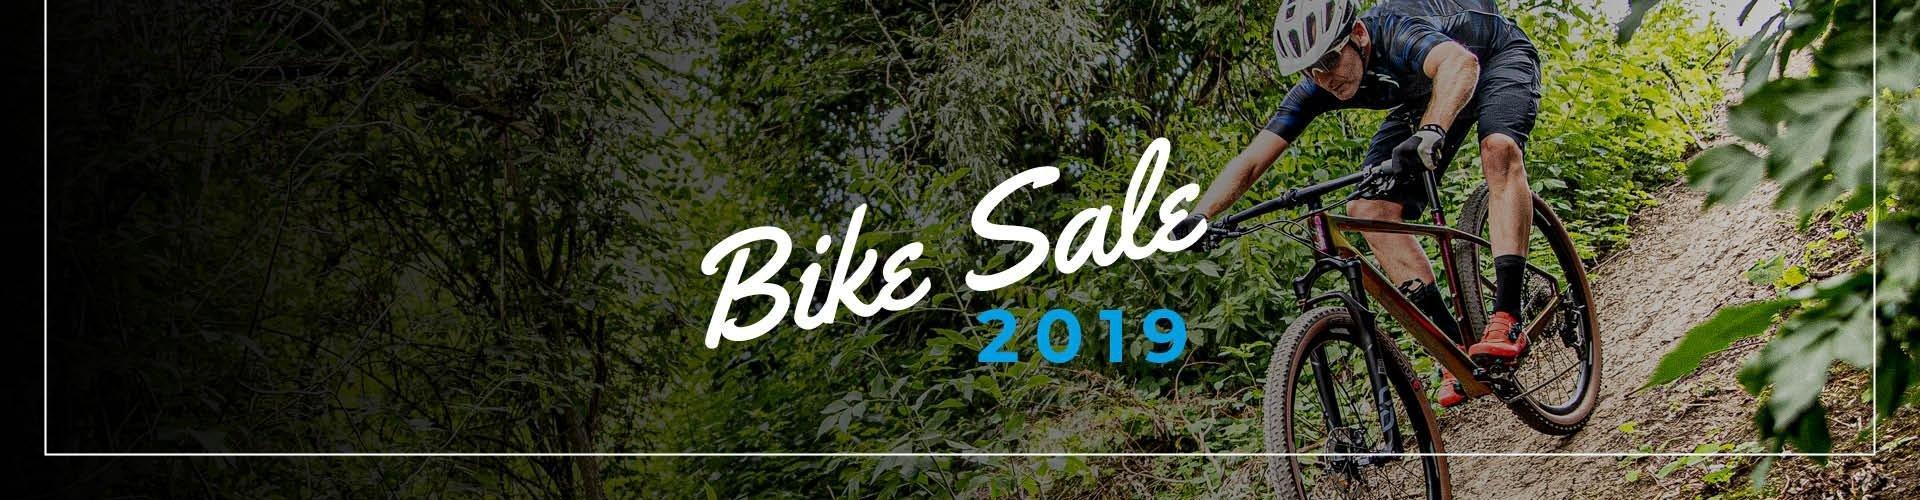 CC5311_BIKEsale_2019-banner.jpg